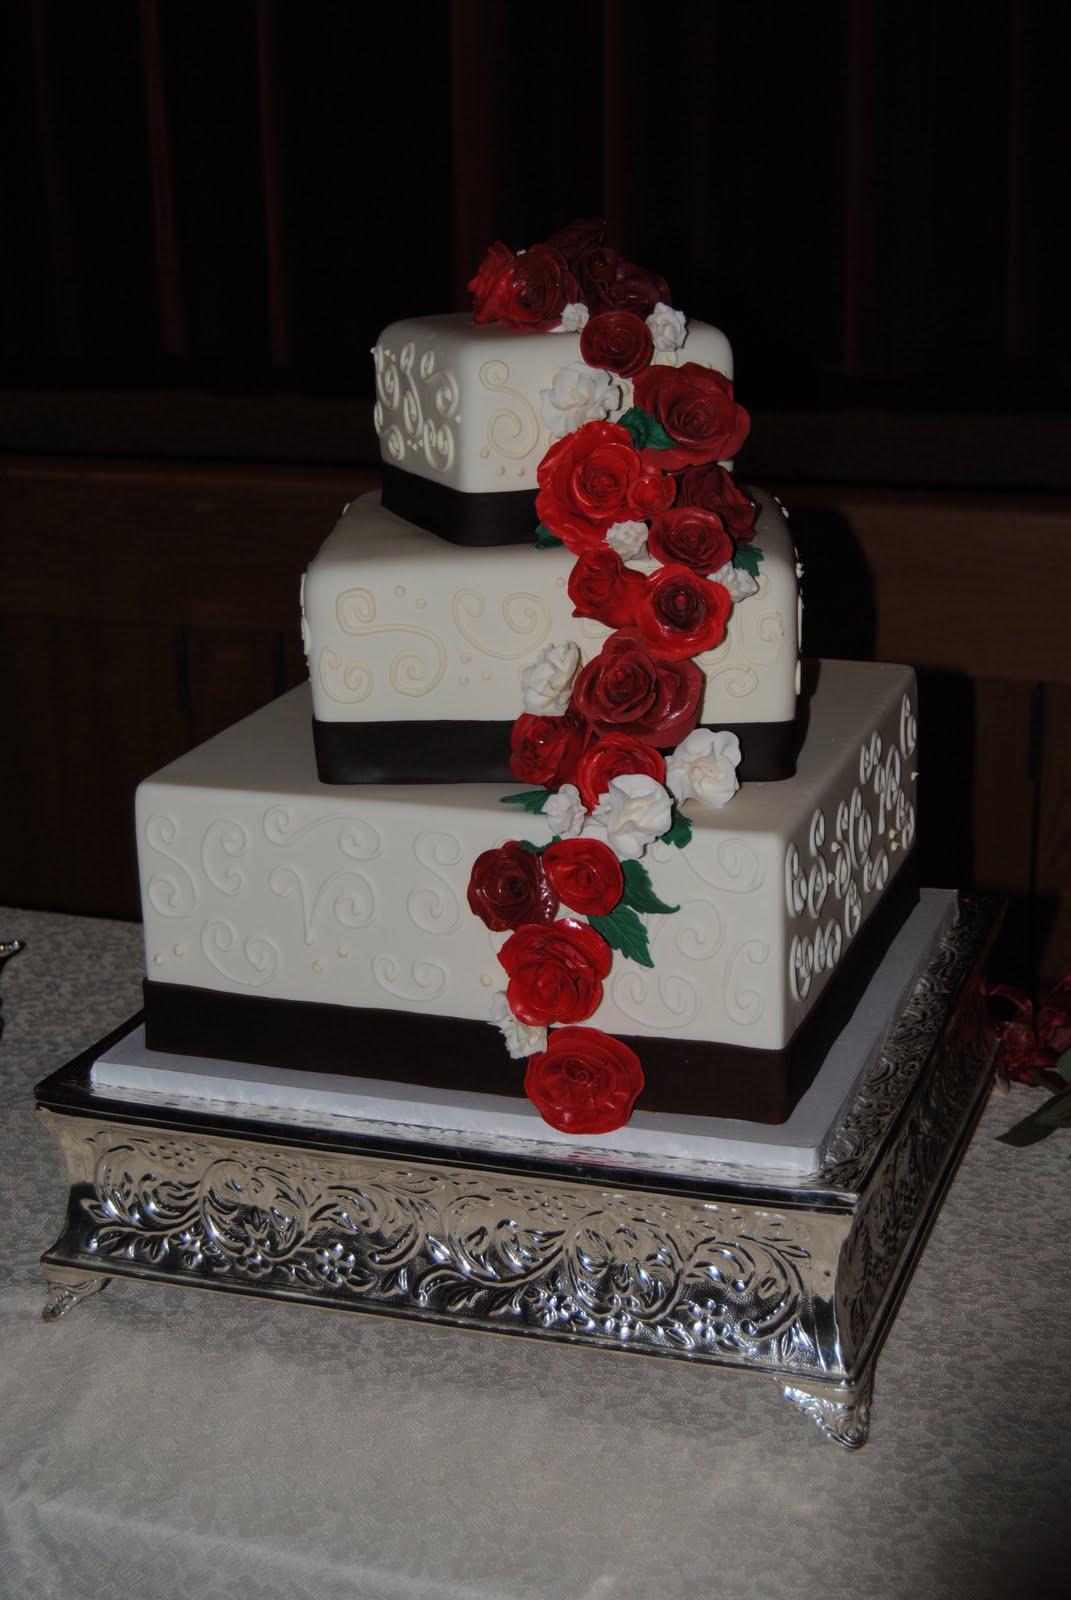 SASSY CAKES Your Fondant Cake Design Destination Square